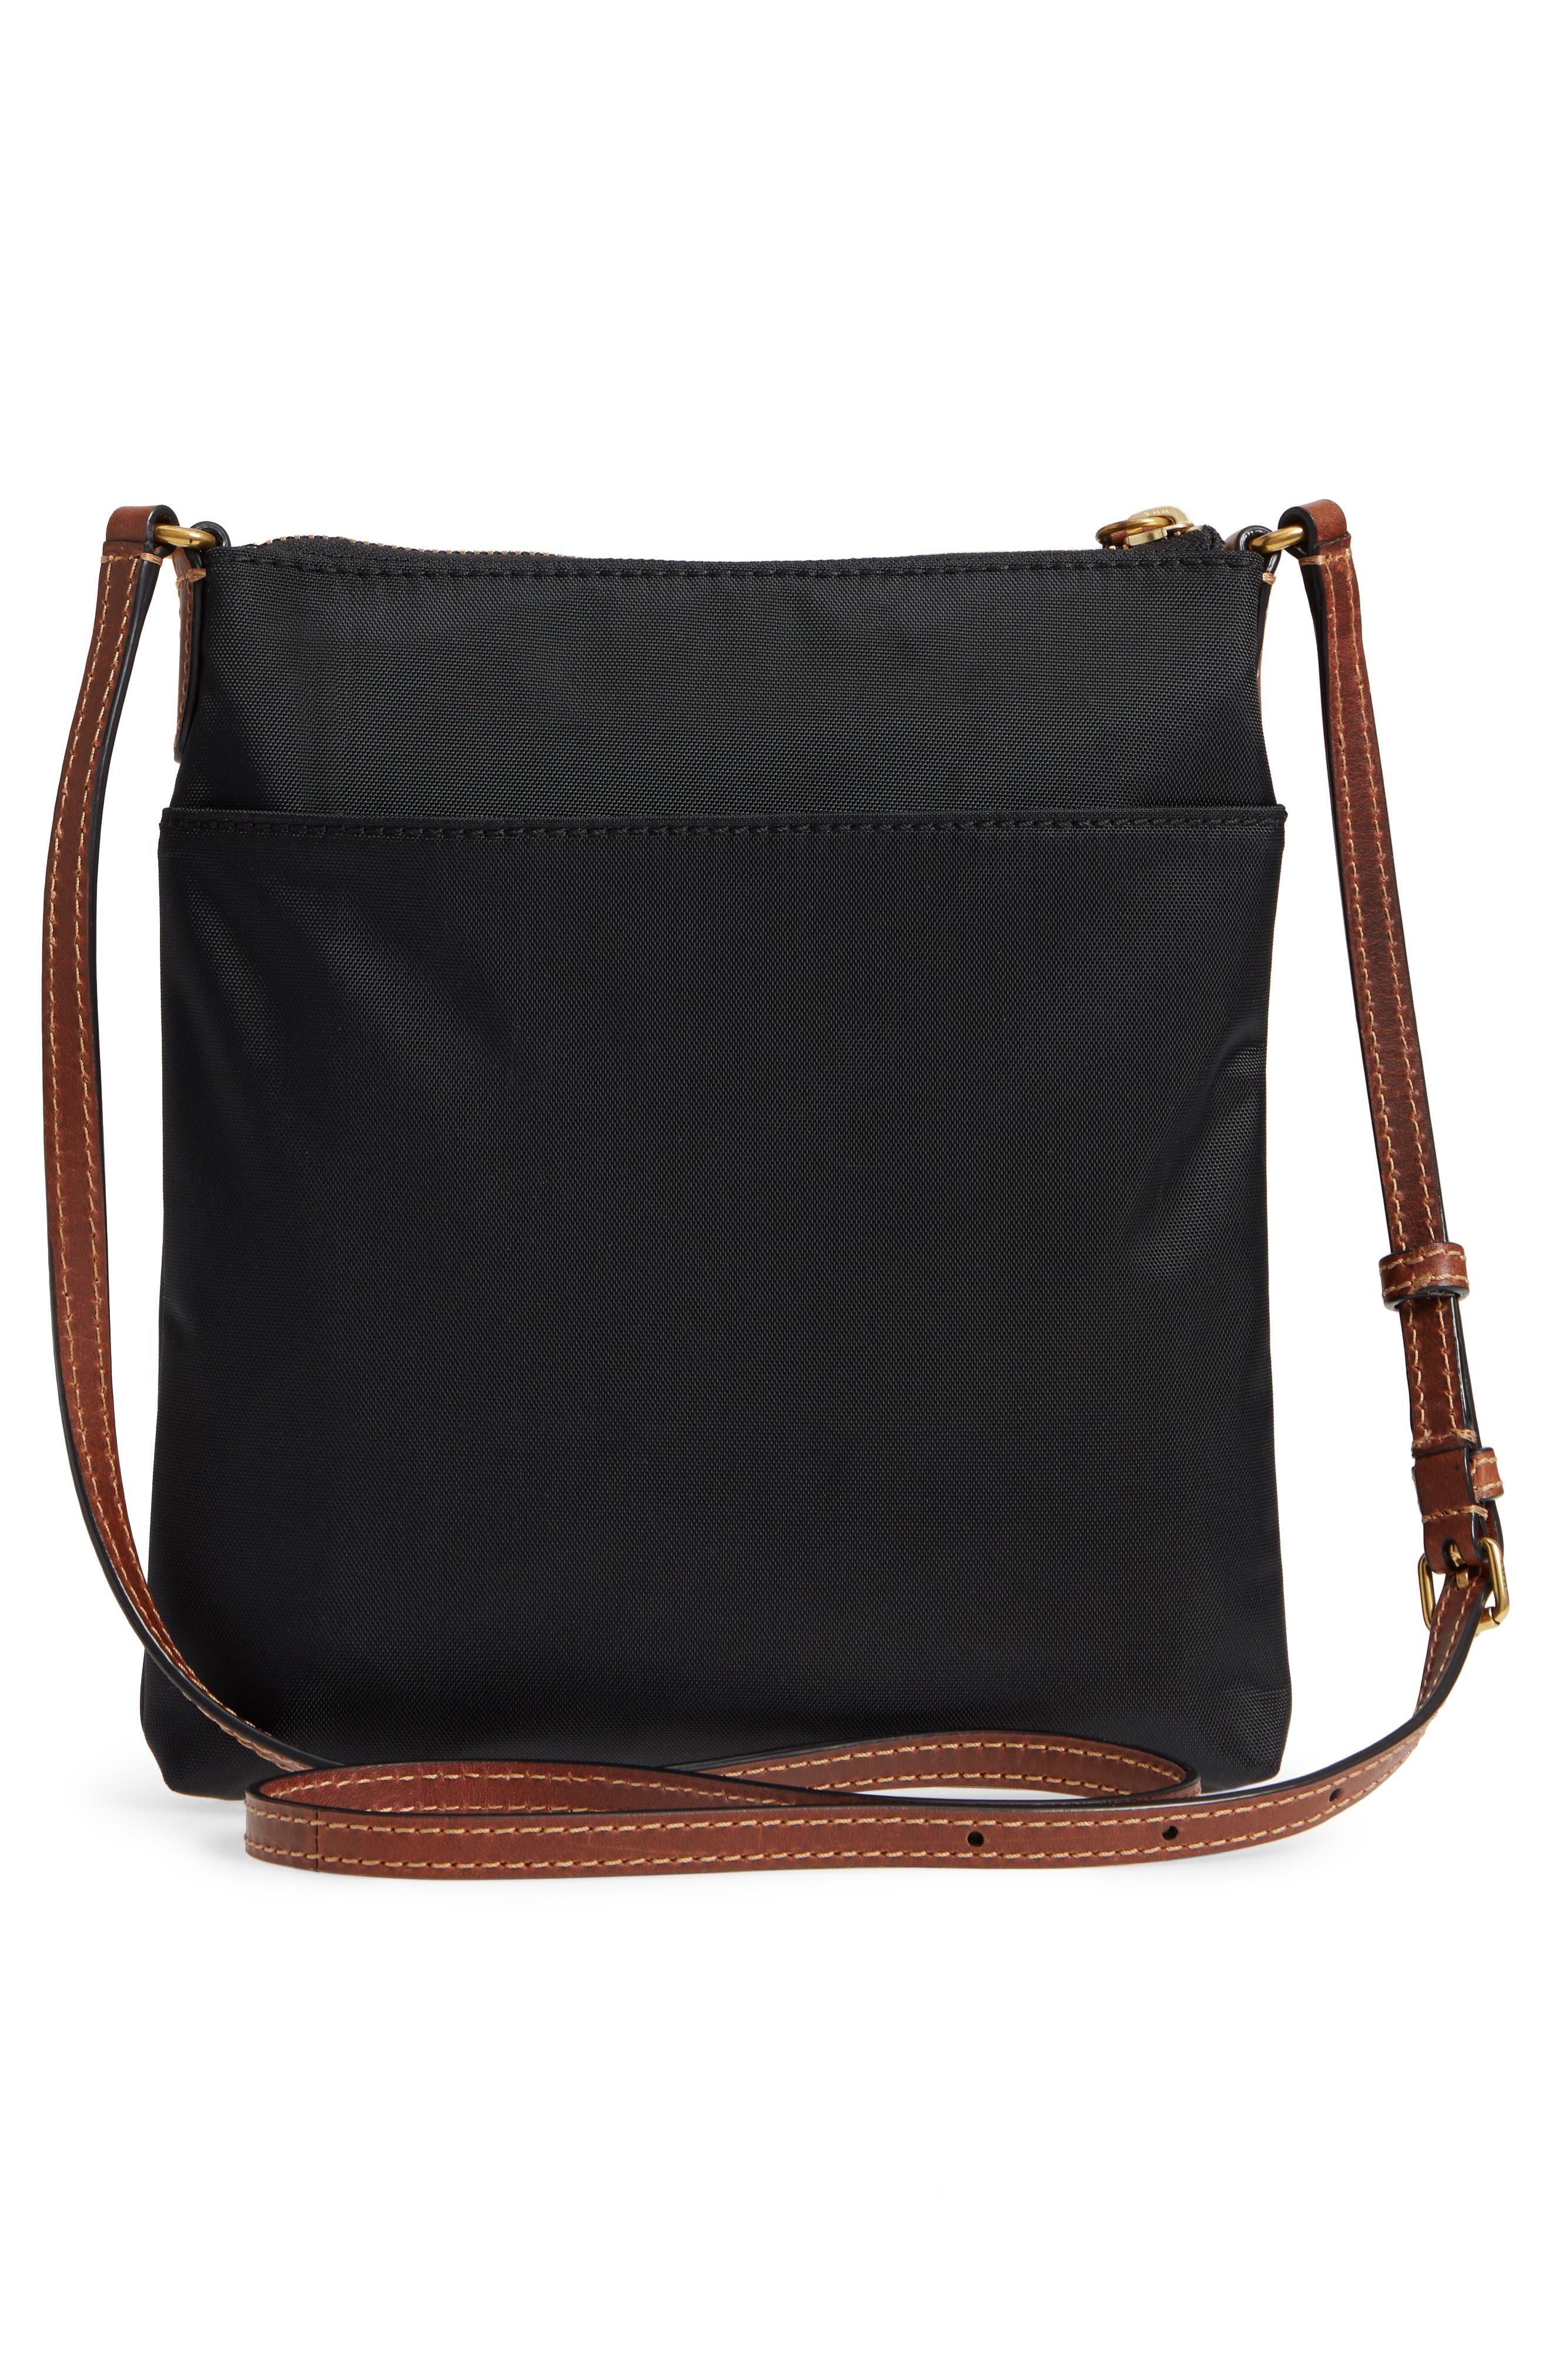 Ivy Nylon Crossbody Bag,                             Alternate thumbnail 3, color,                             001